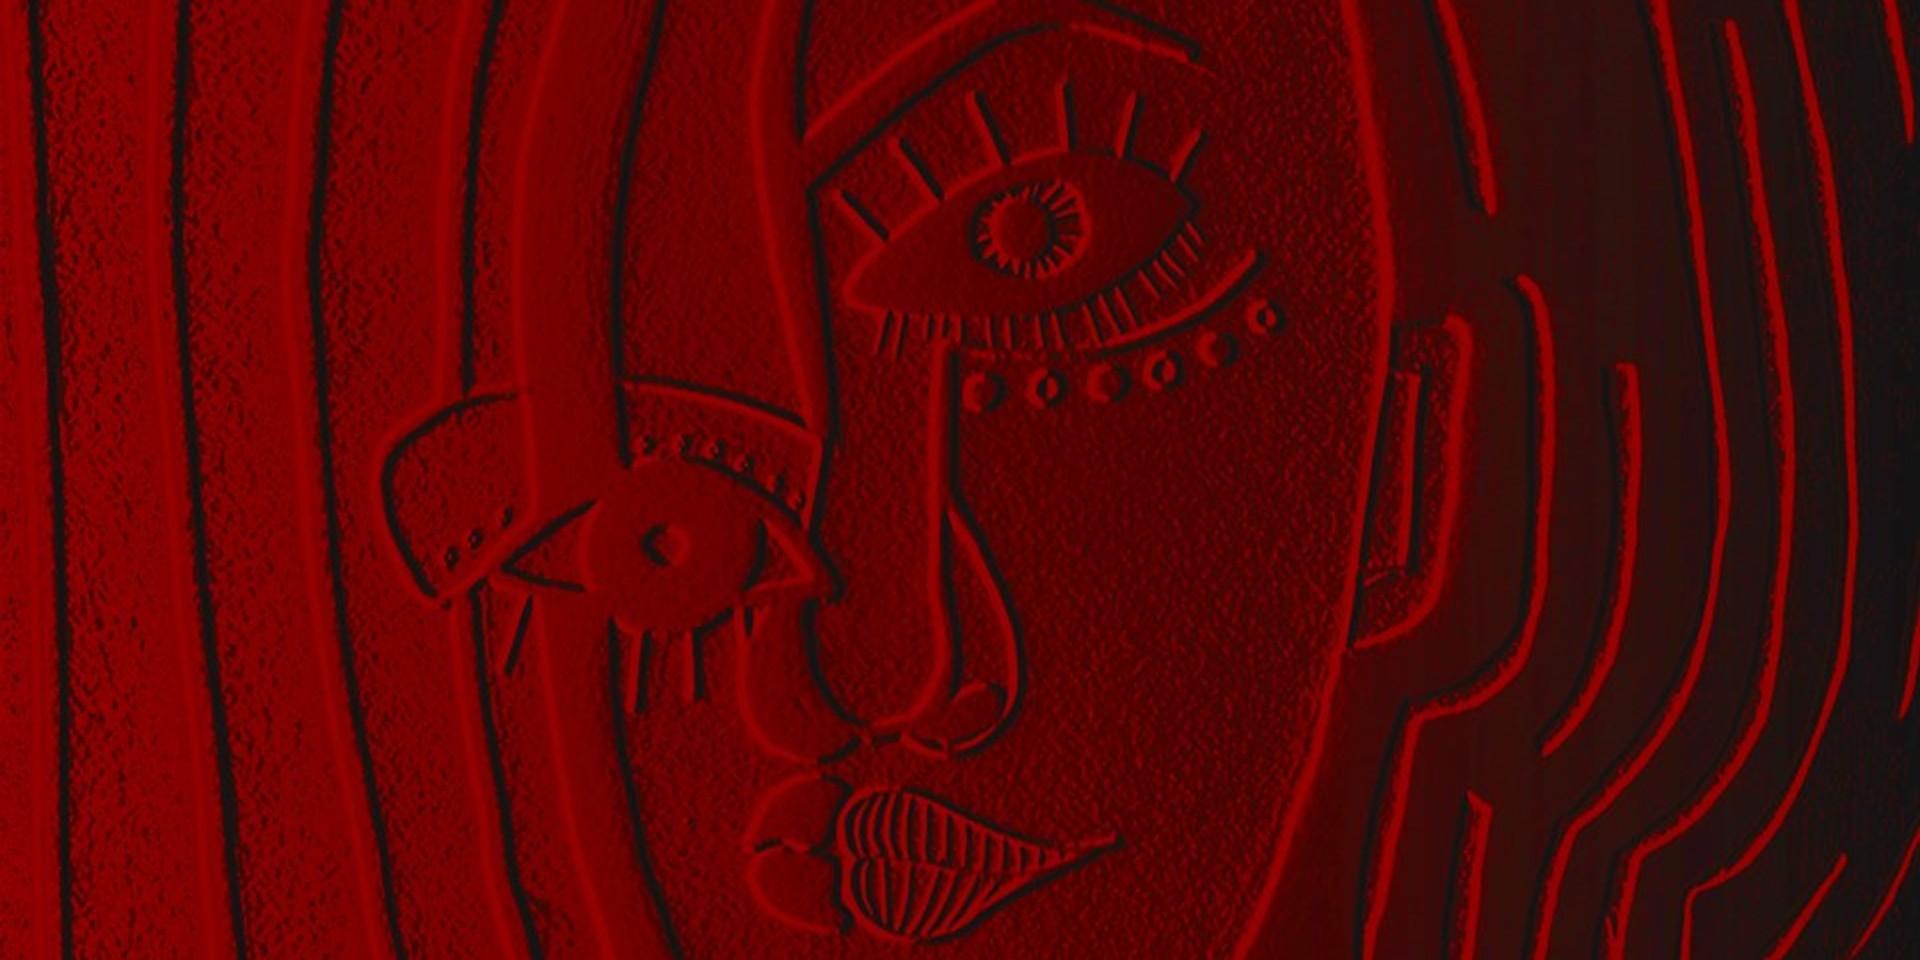 Yolanda Moon release moody new single 'Lipas' – listen